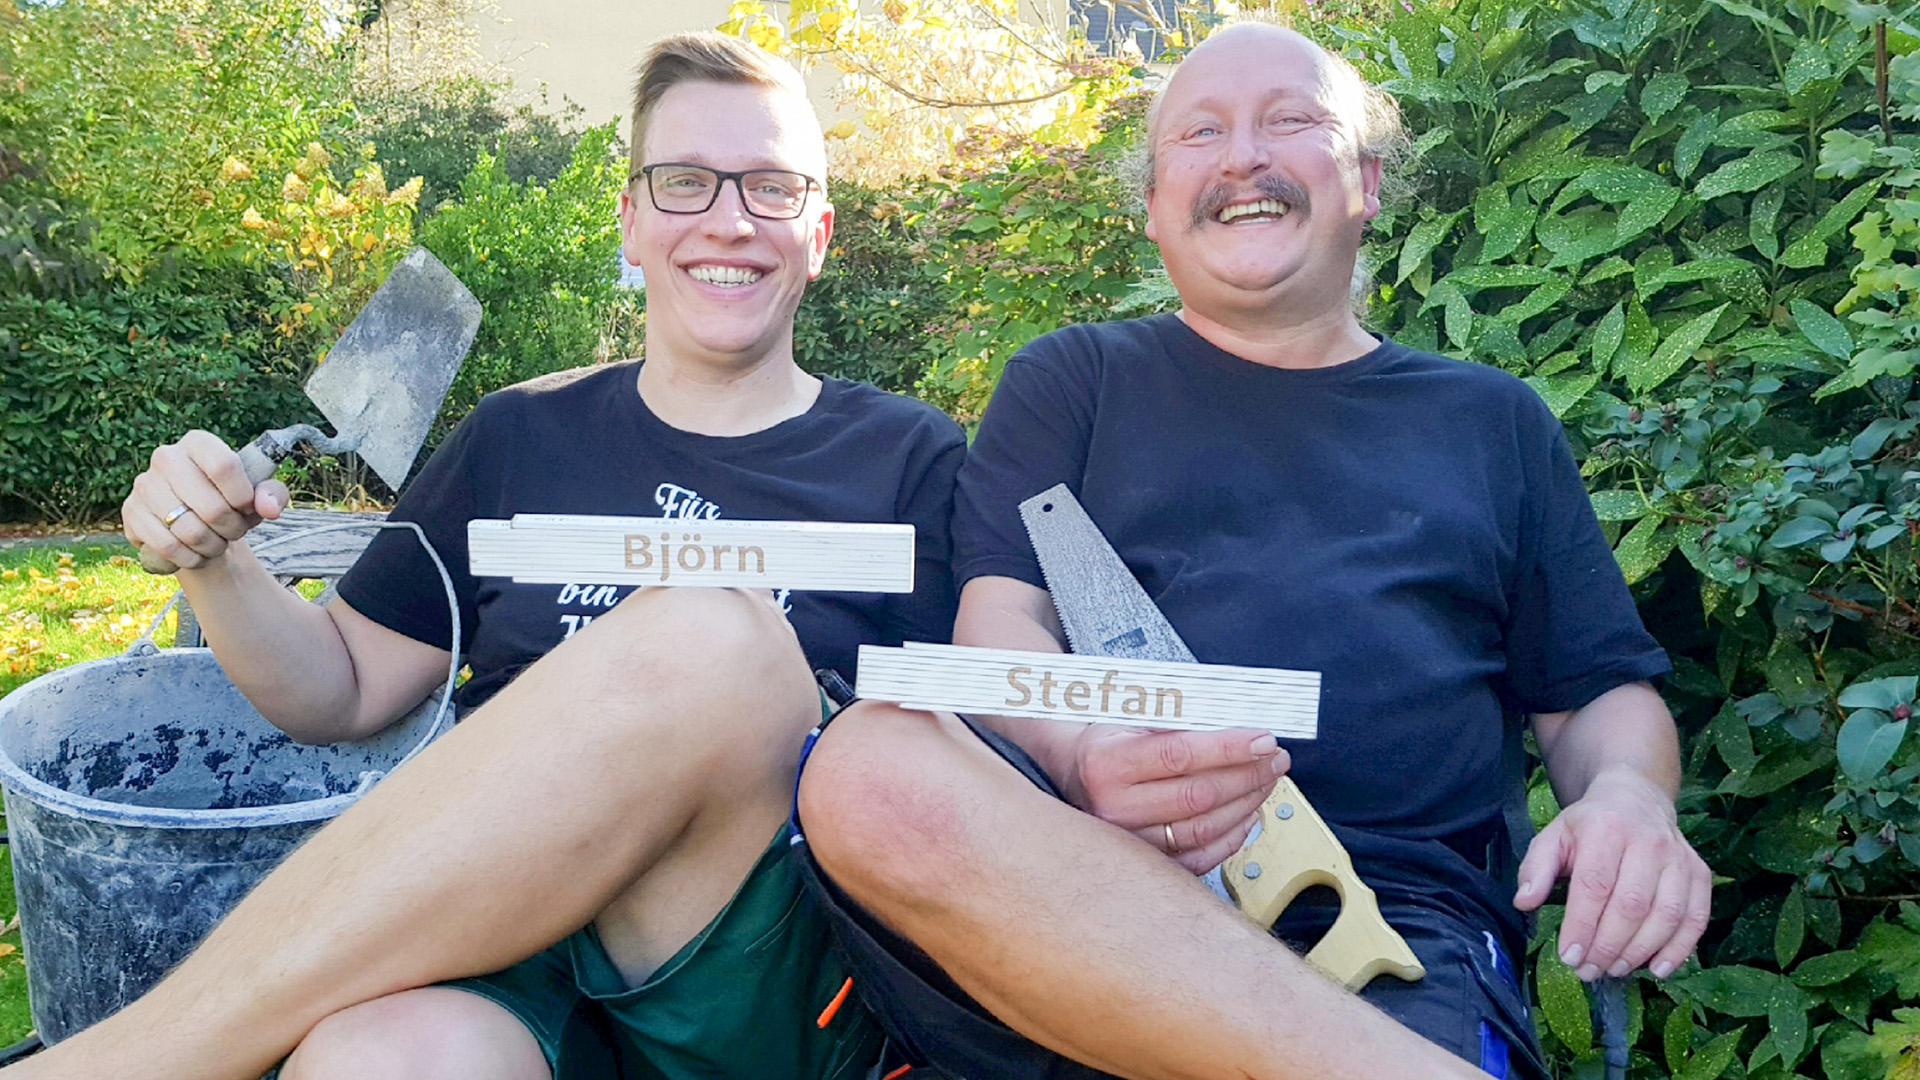 Heute u.a. mit: Stefan & Björn - Außen-Badewanne | Folge 13